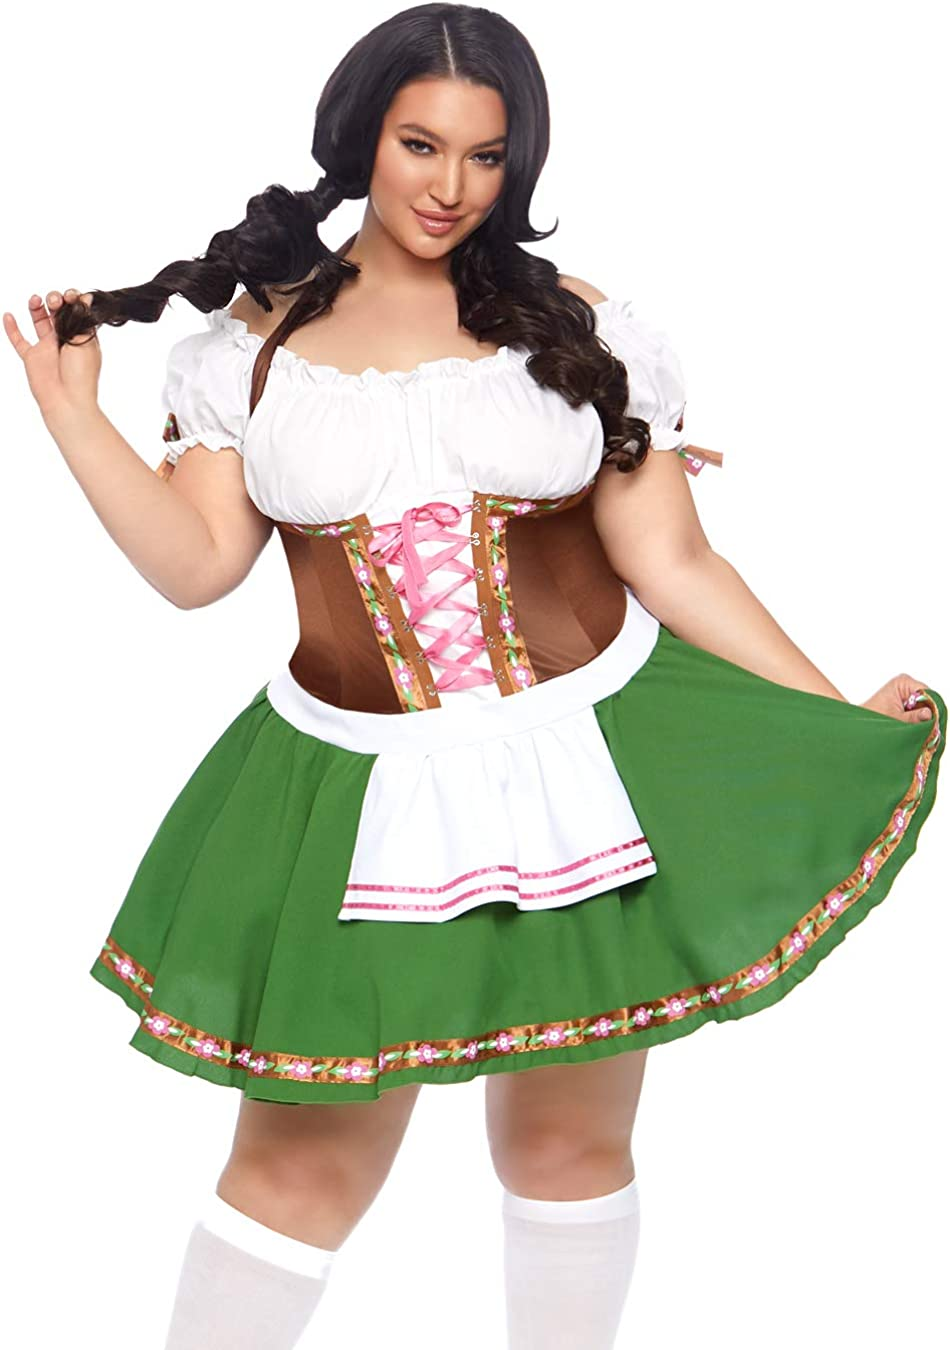 LEG AVENUE LIL/' GERMAN GIRL OKTOBERFEST BAVARIAN Ladies Fancy Dress Outift 83668